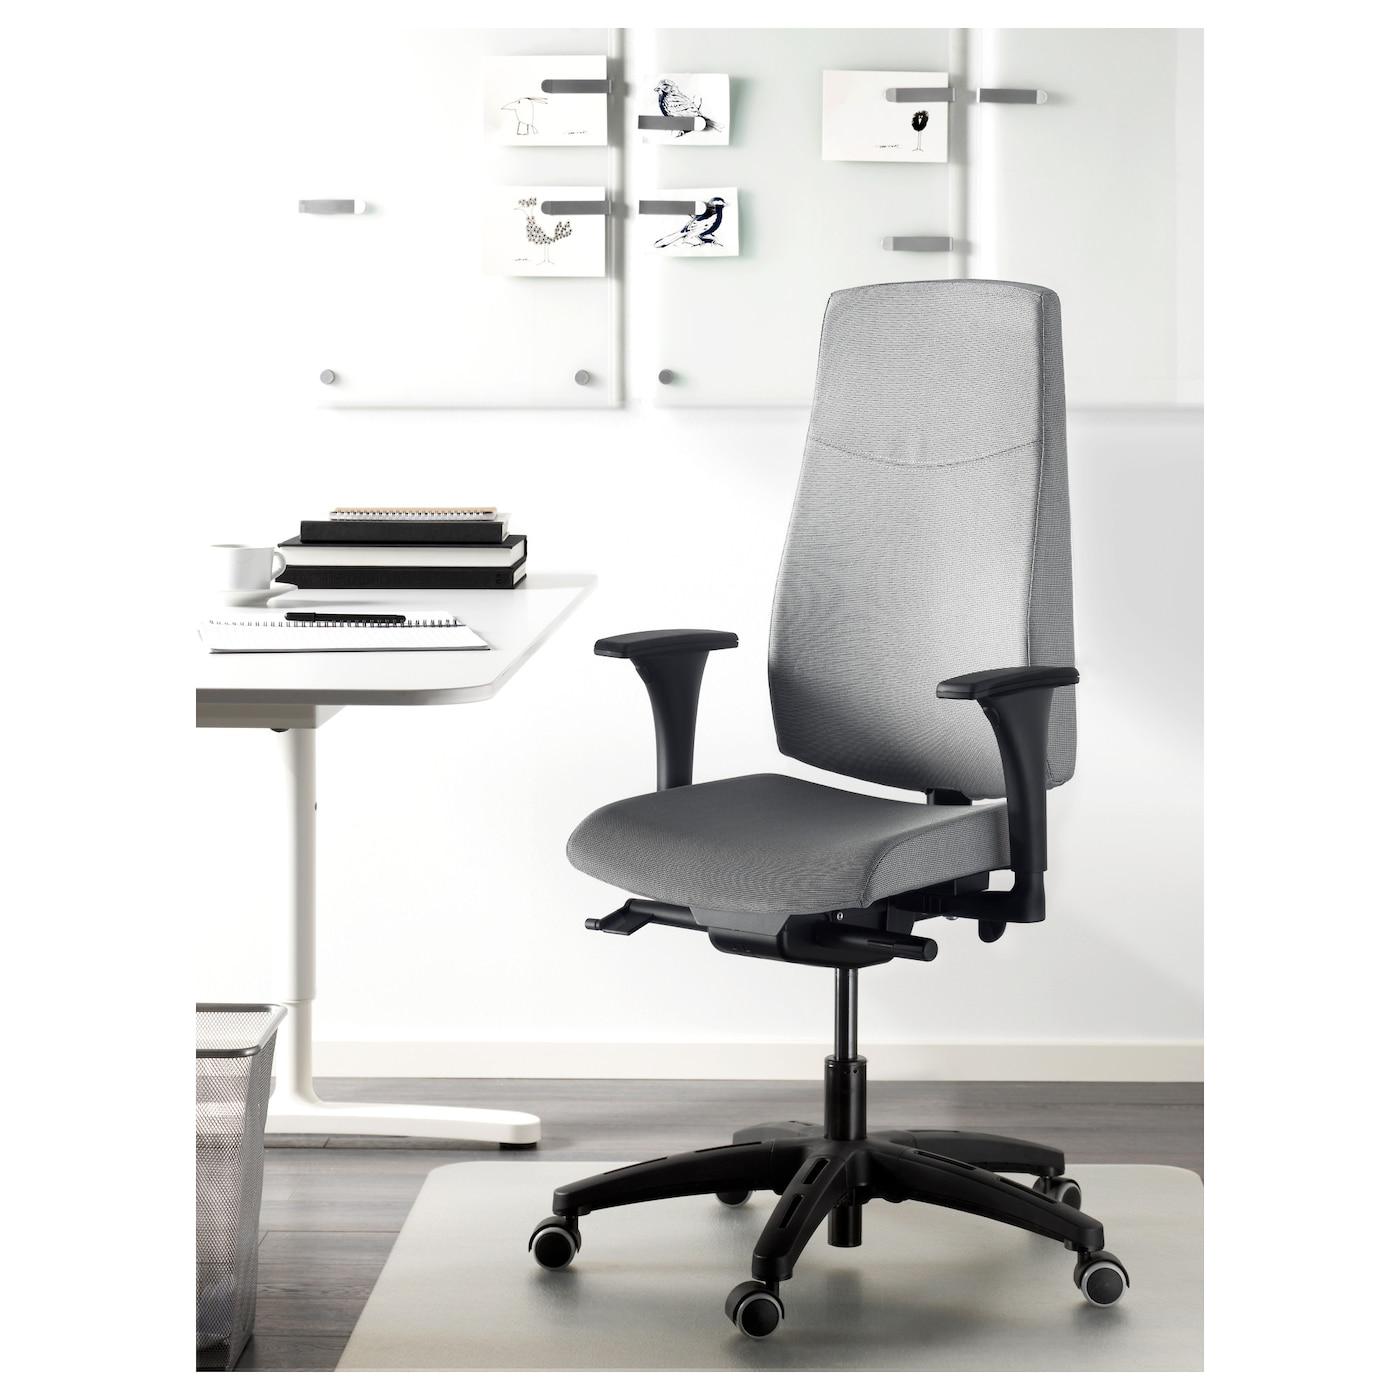 VOLMAR Swivel chair with armrests Grey IKEA